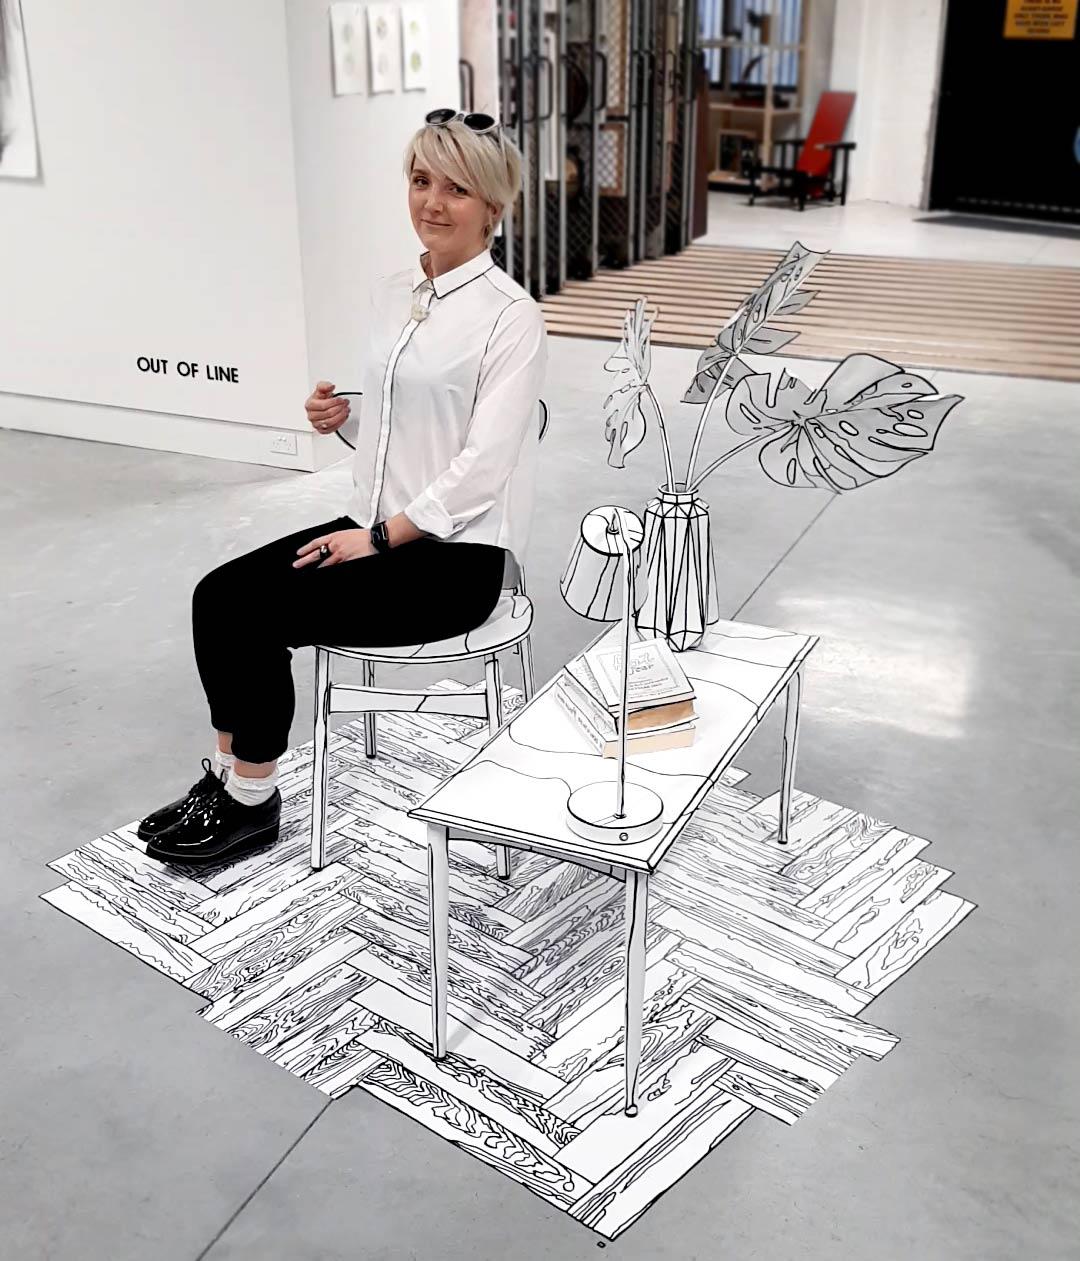 Anastasia Parmson sitting in her drawing installation